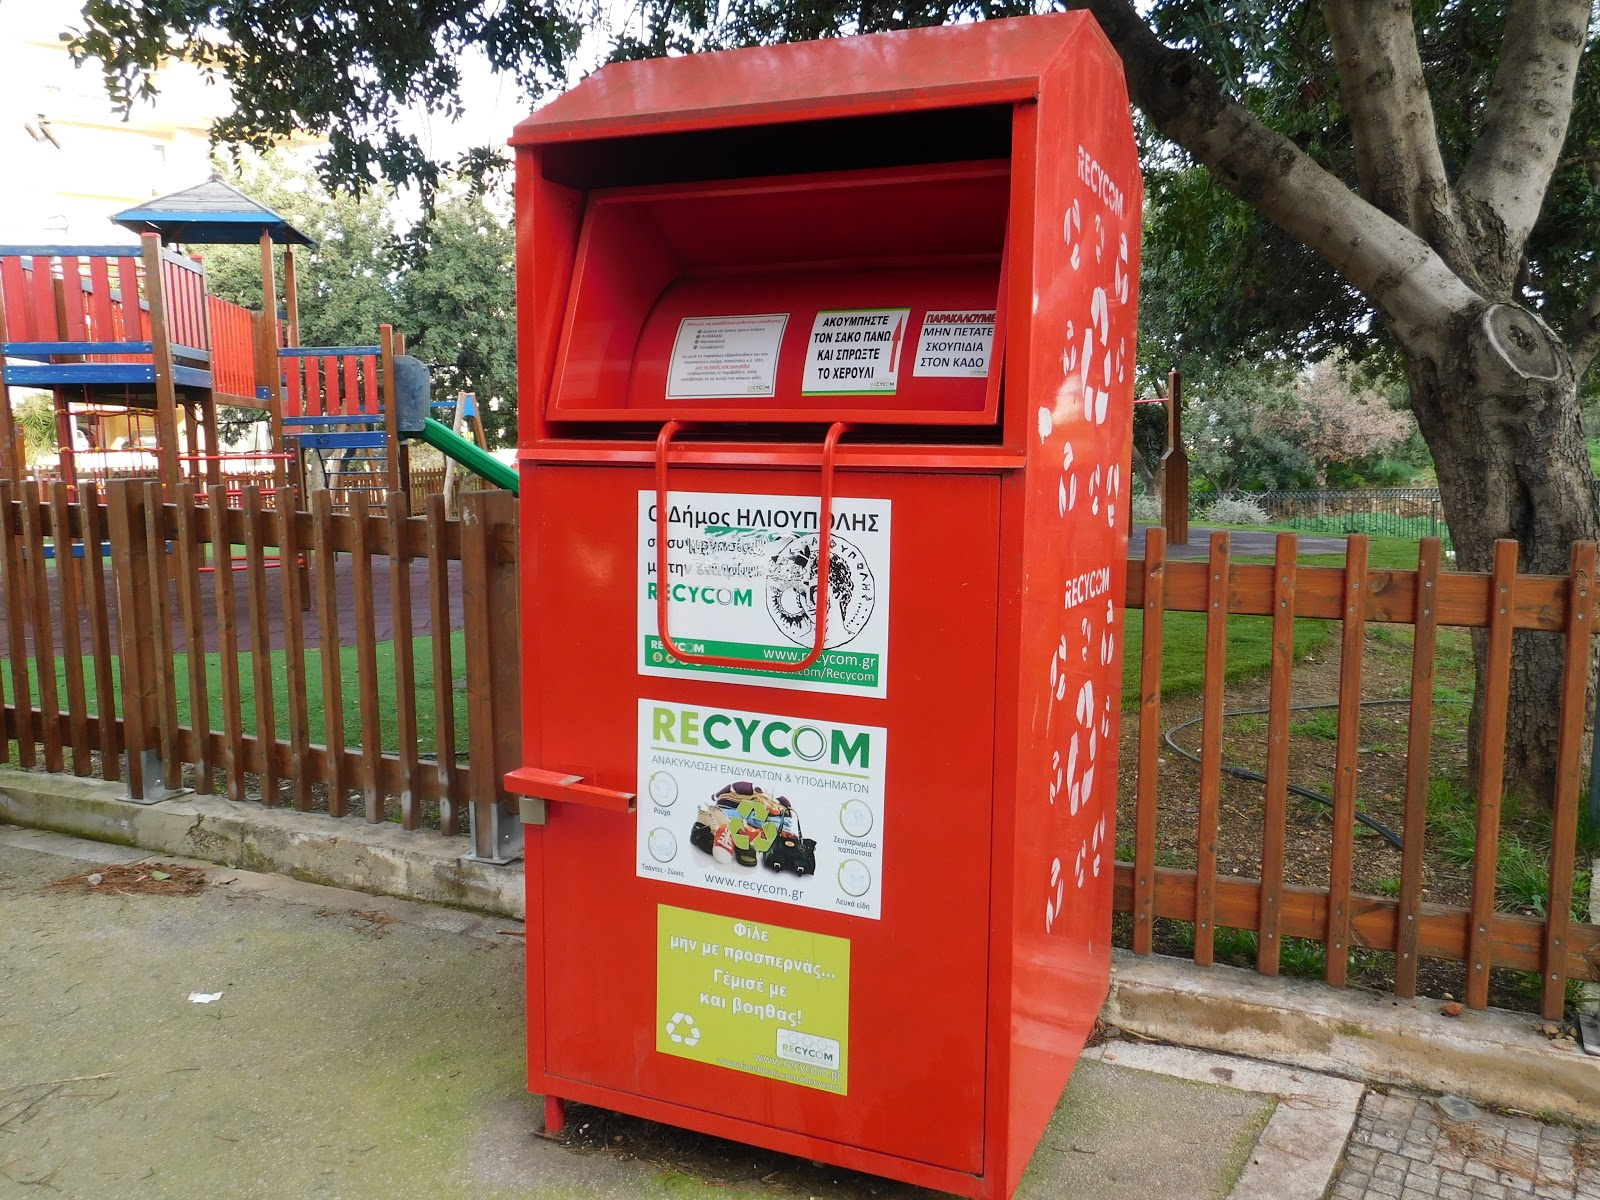 de52954a7193 110 τόνους ενδυμάτων και υποδημάτων αποκόμισε από τους ειδικούς κόκκινους  κάδους ανακύκλωσης ρούχων του Δήμου Ηλιούπολης η εταιρεία ανακύκλωσης  ενδυμάτων ...